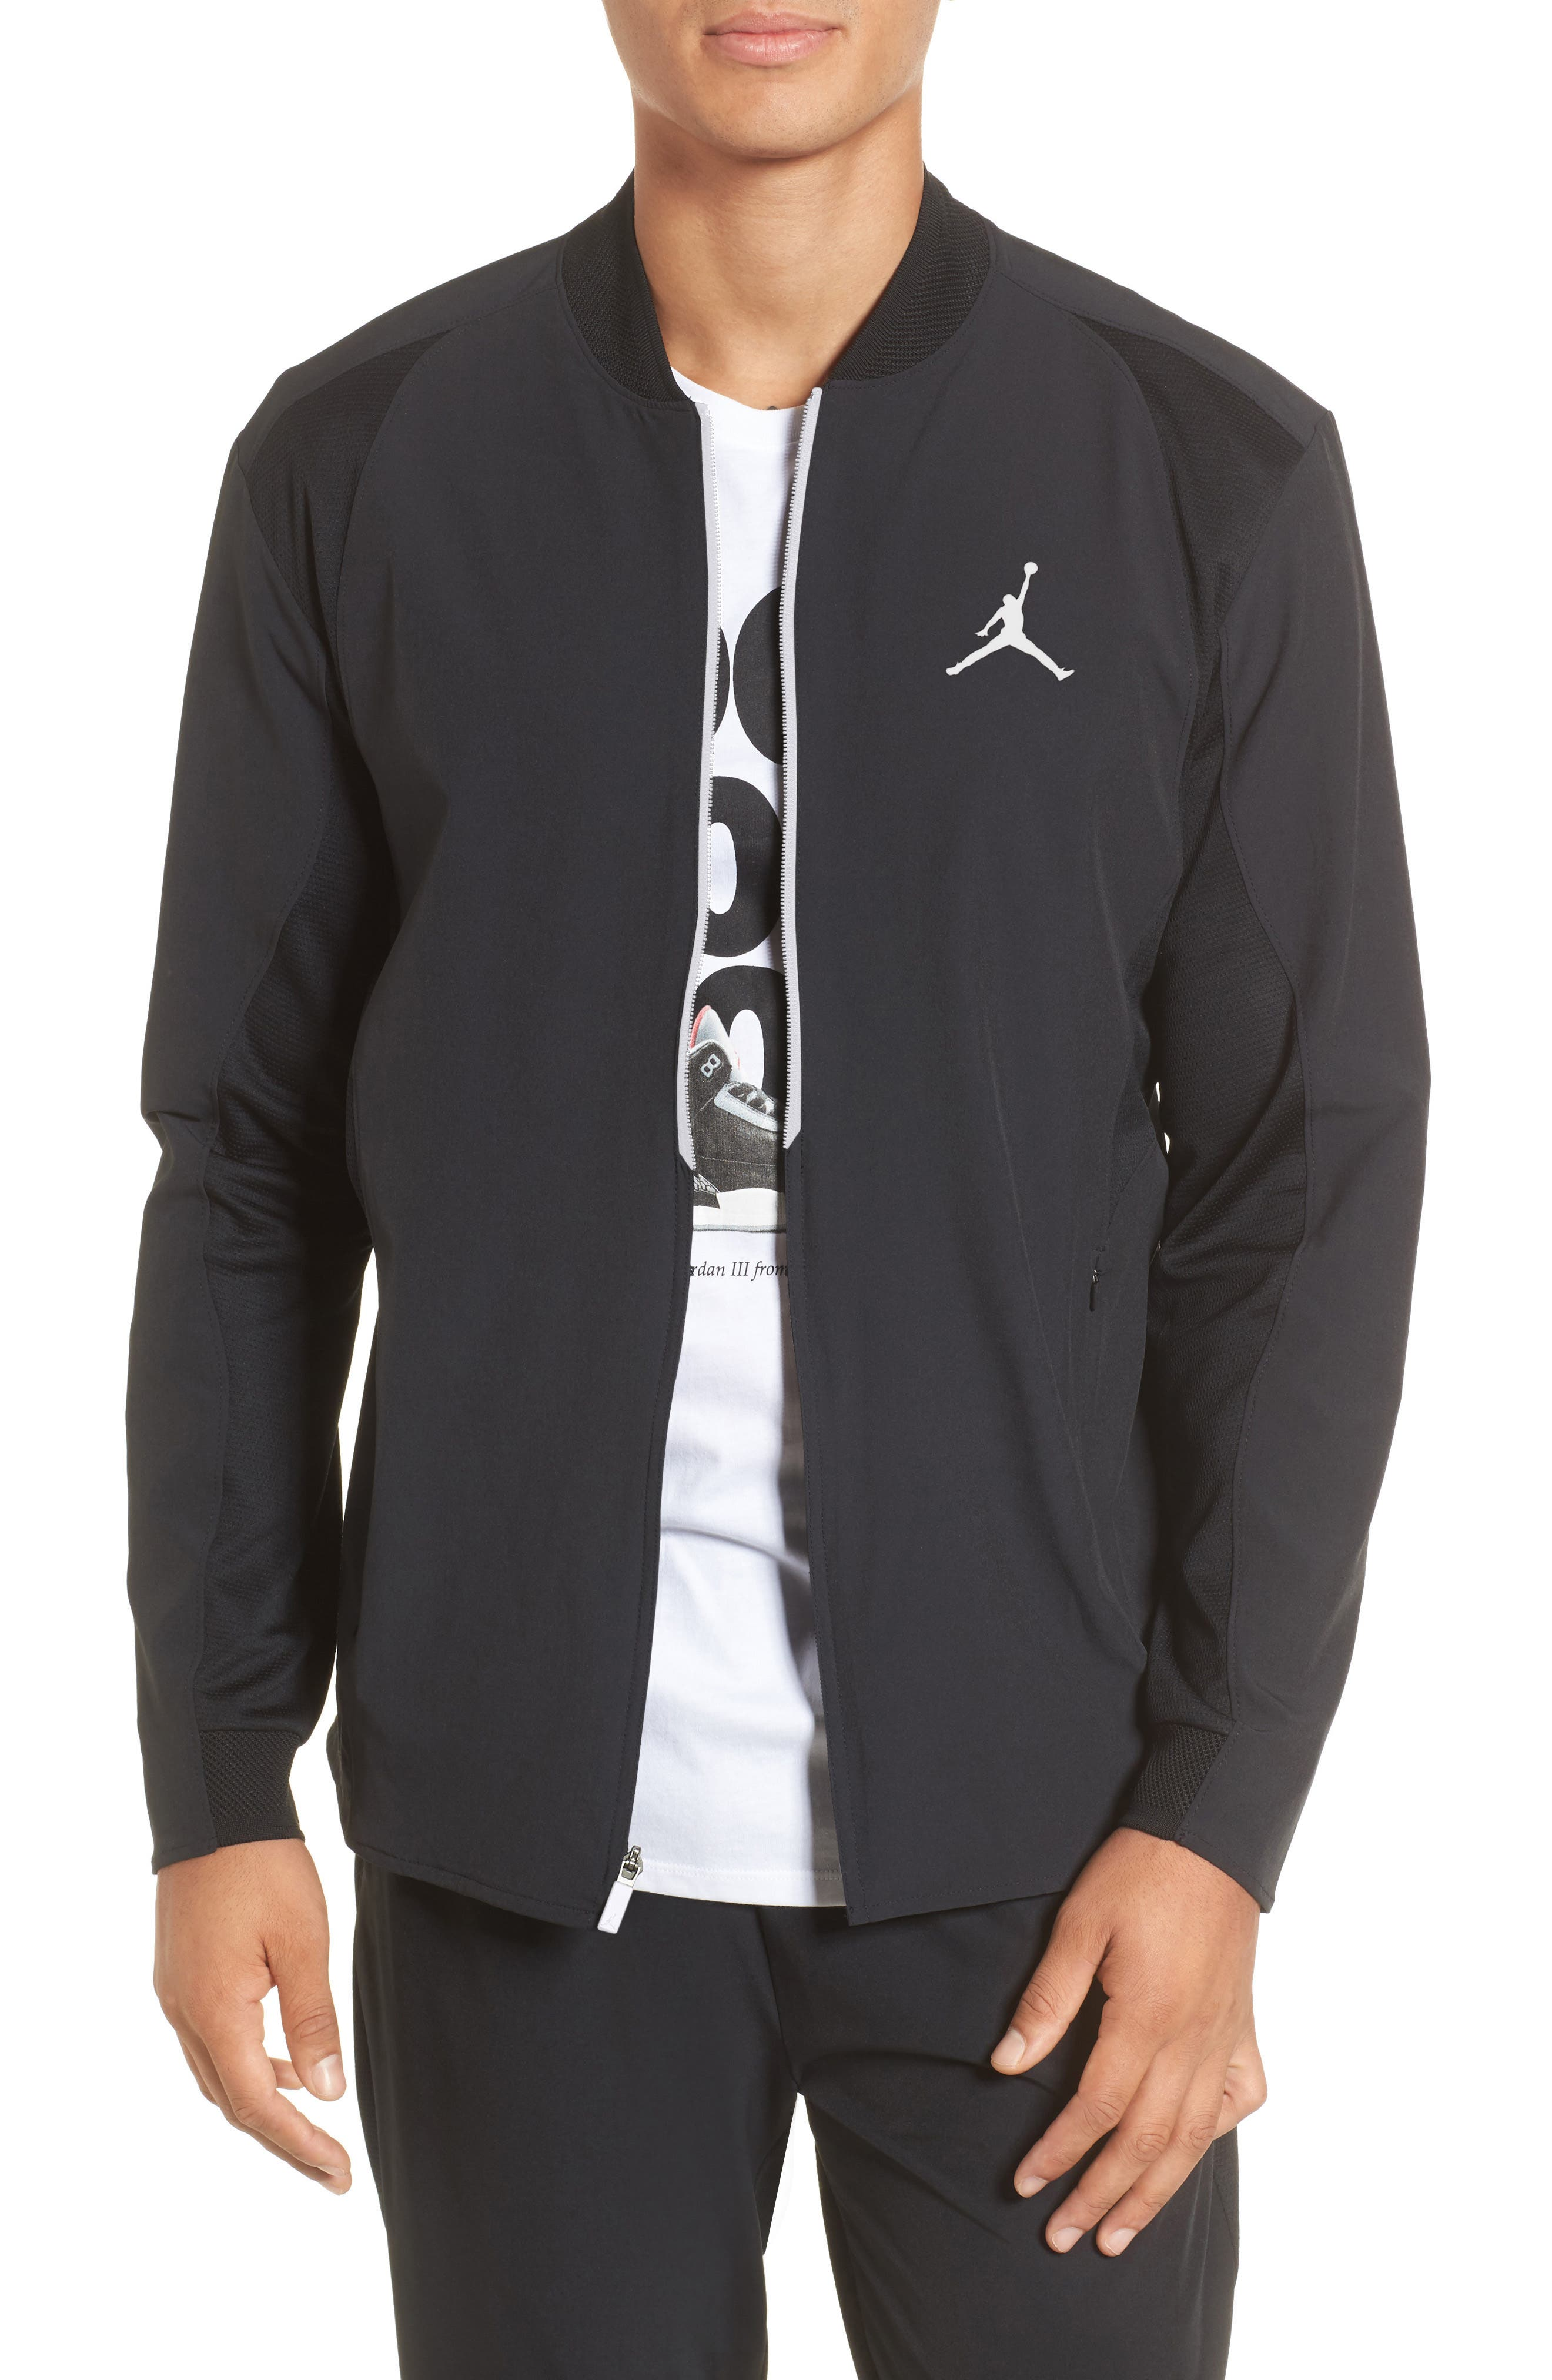 23 Alpha Dry Jacket,                         Main,                         color,